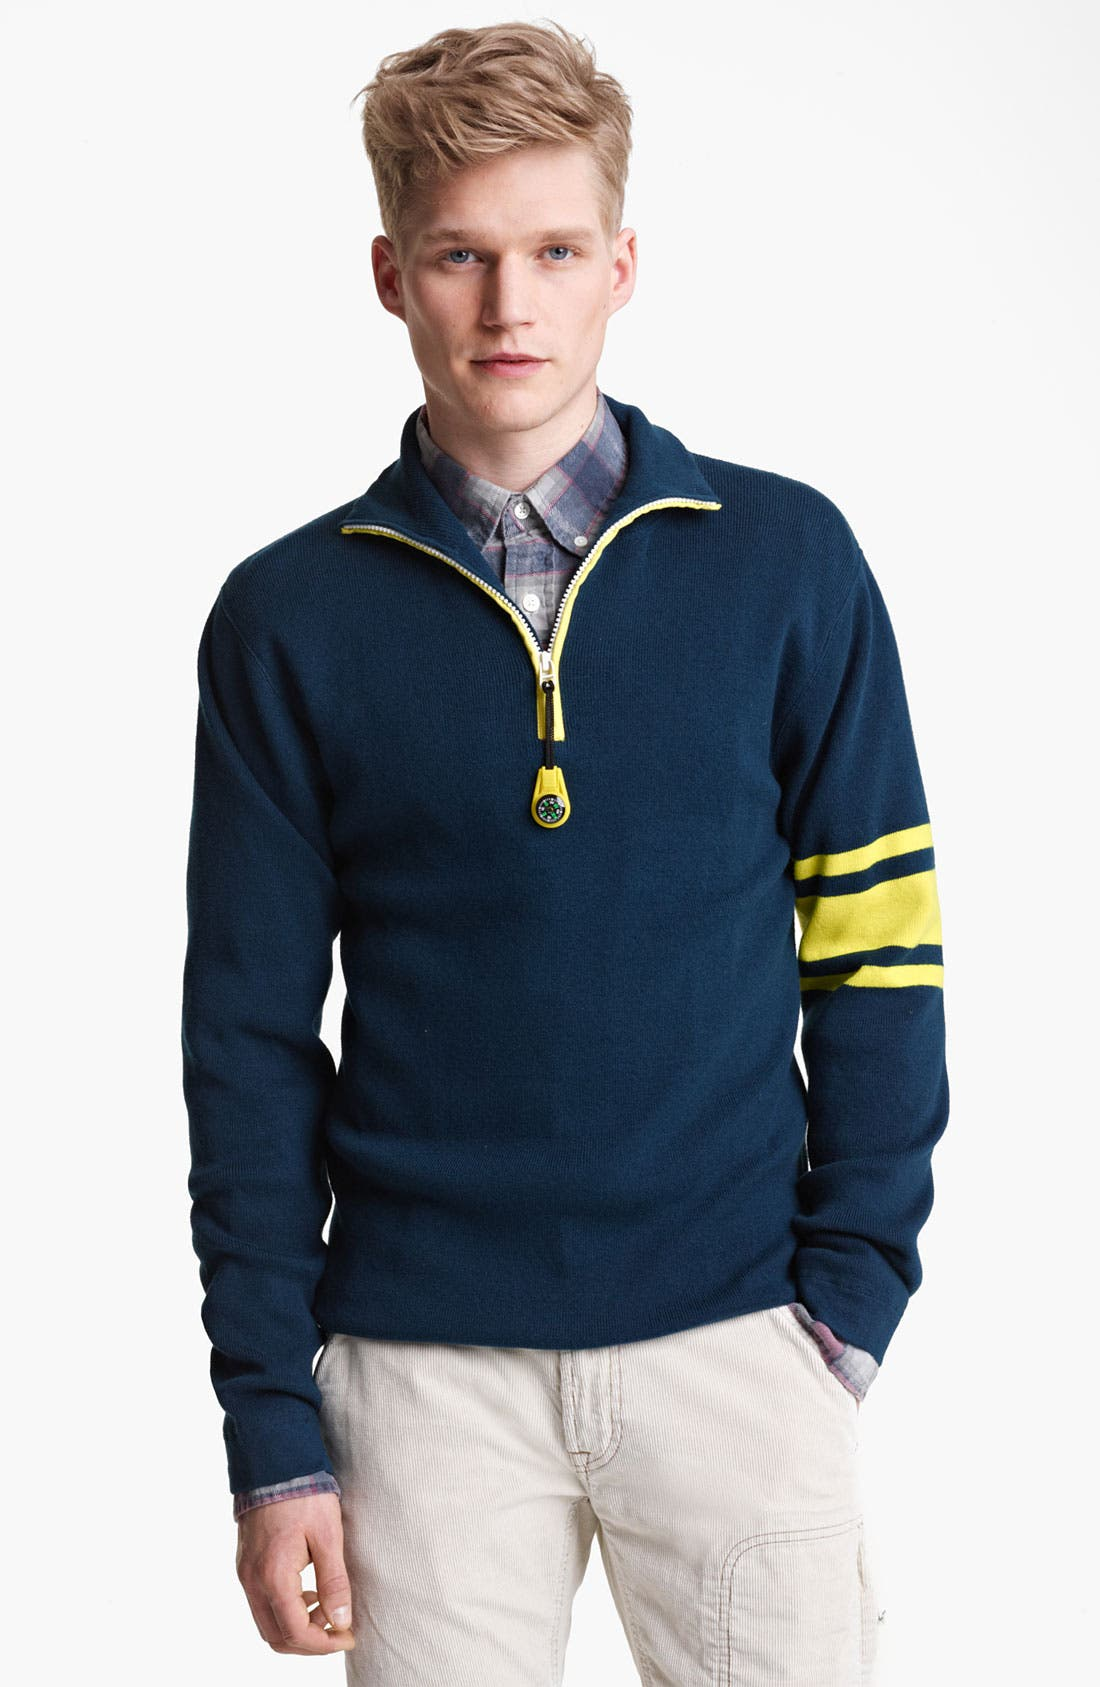 Alternate Image 1 Selected - Gant by Michael Bastian Quarter Zip Knit Pullover